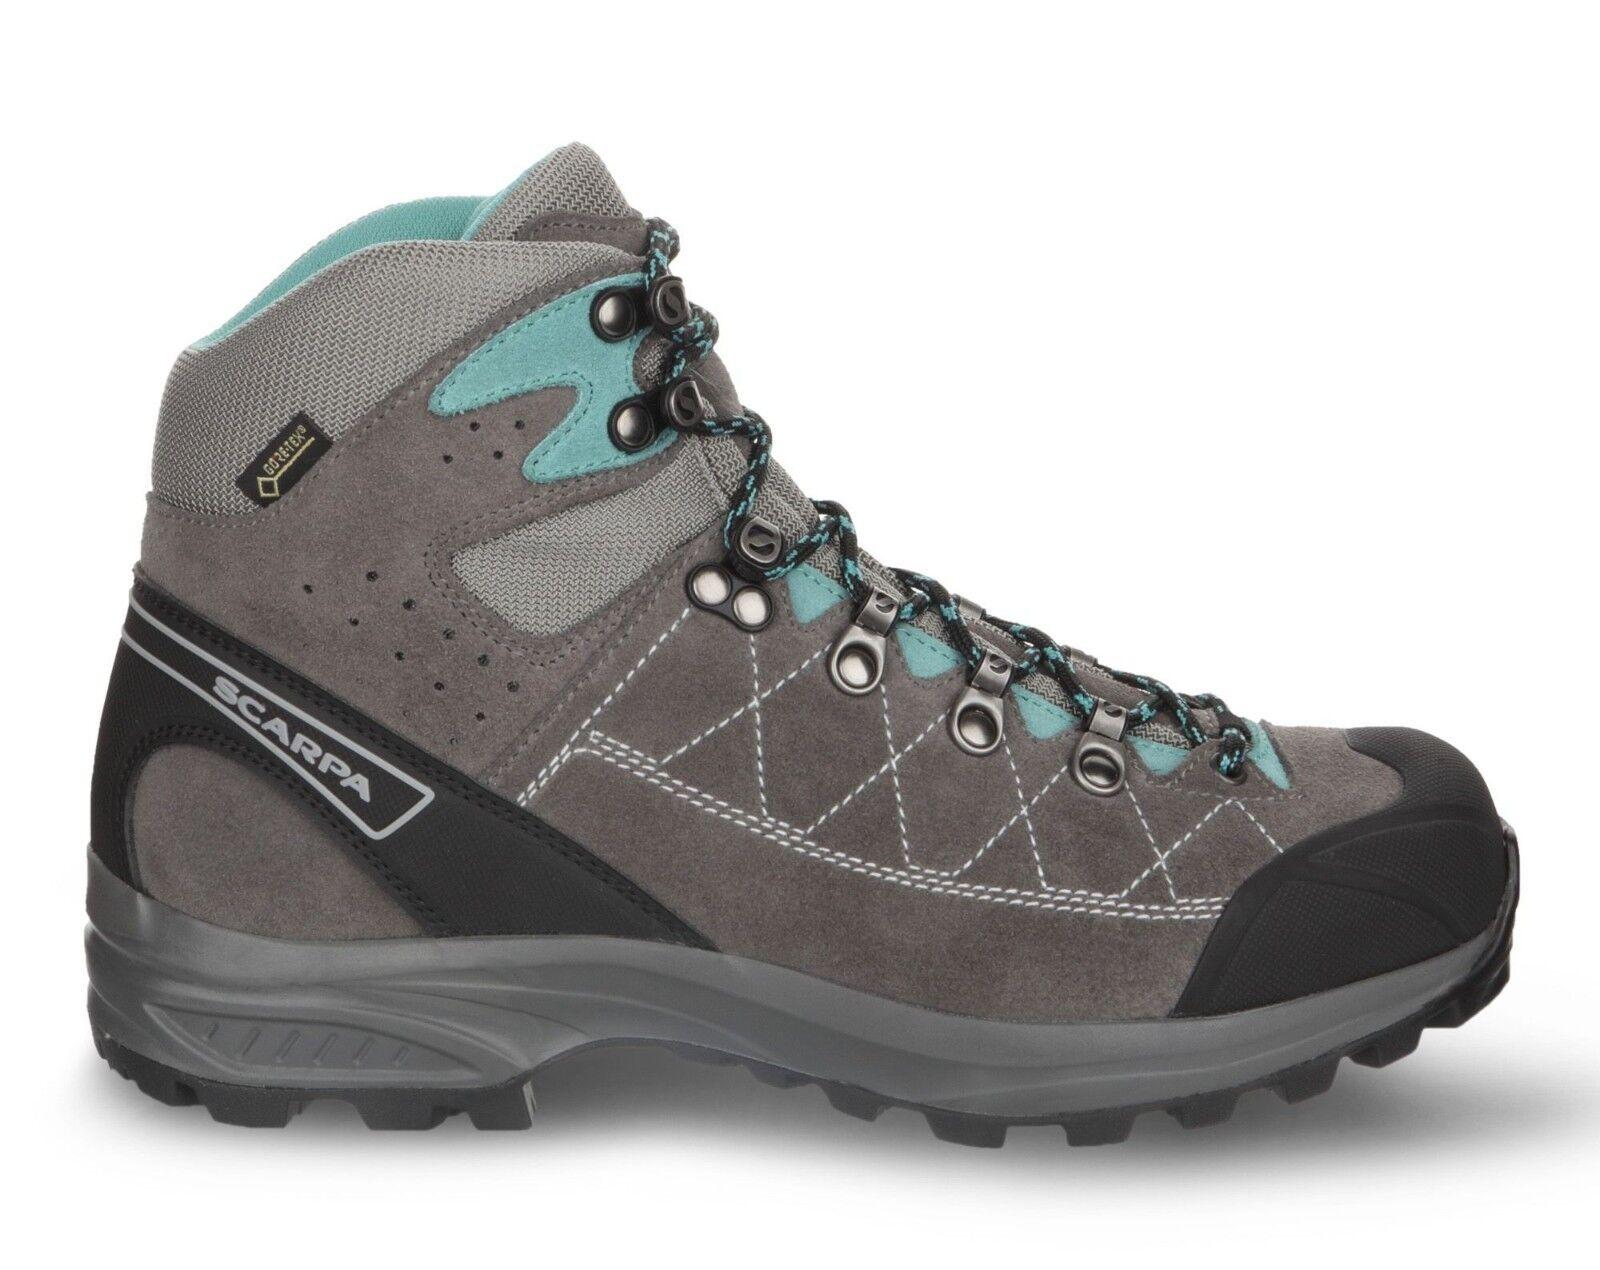 Scarpa 61056 202 Women's Kailash Trek GTX Gore-Tex Vibram Trail Hiking Boots